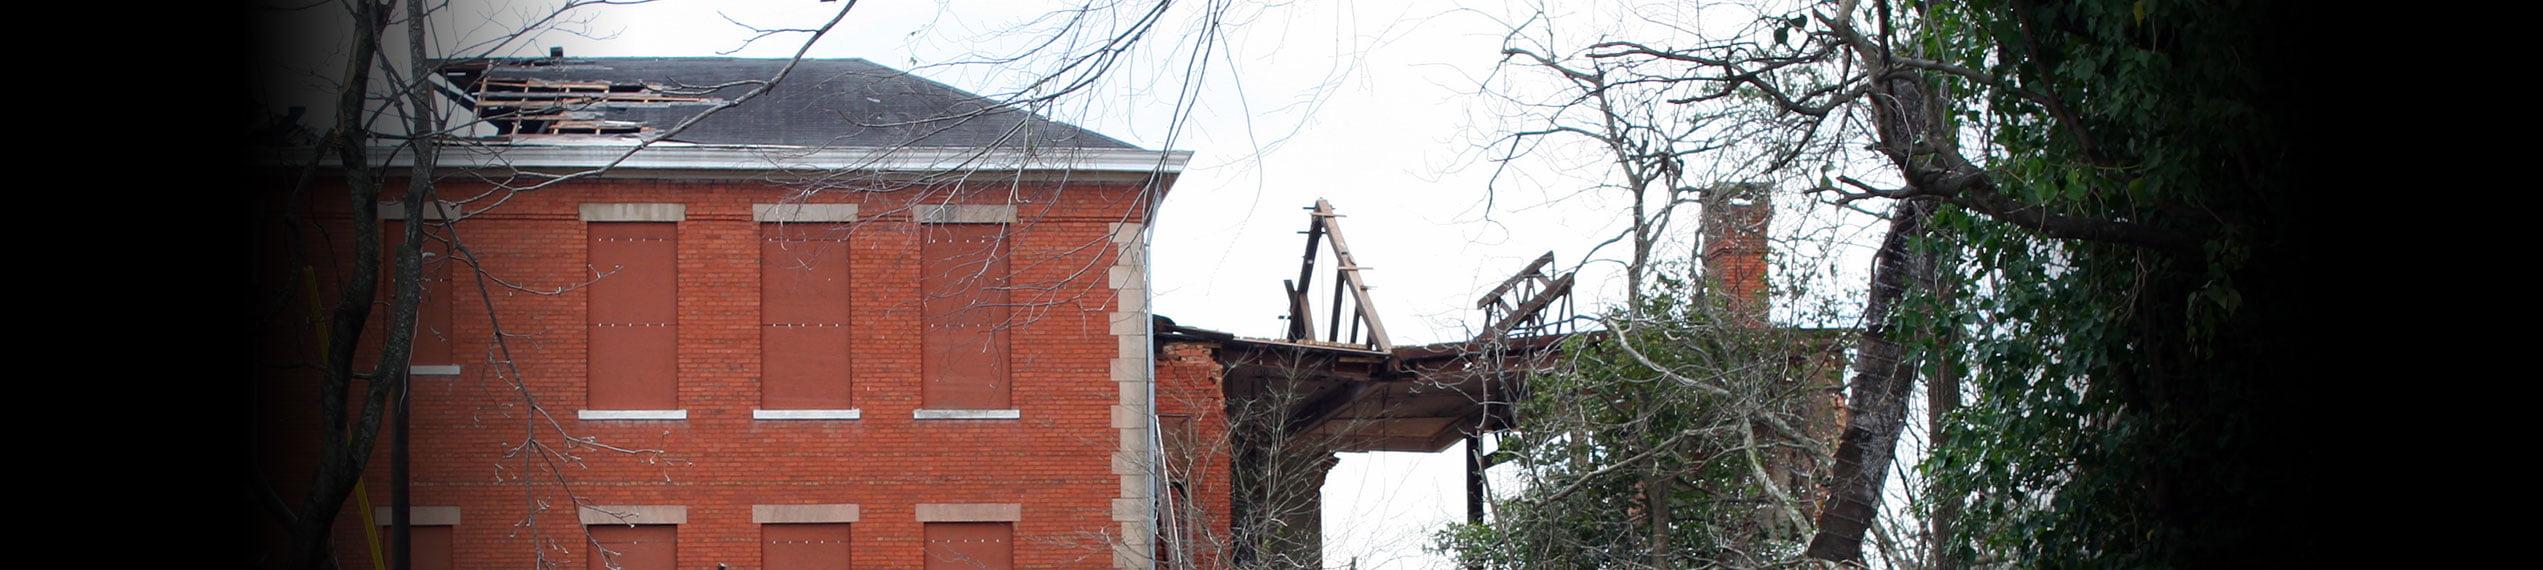 Wind & Storm Damage Repairs in Paul Davis Restoration of Western Pennsylvania